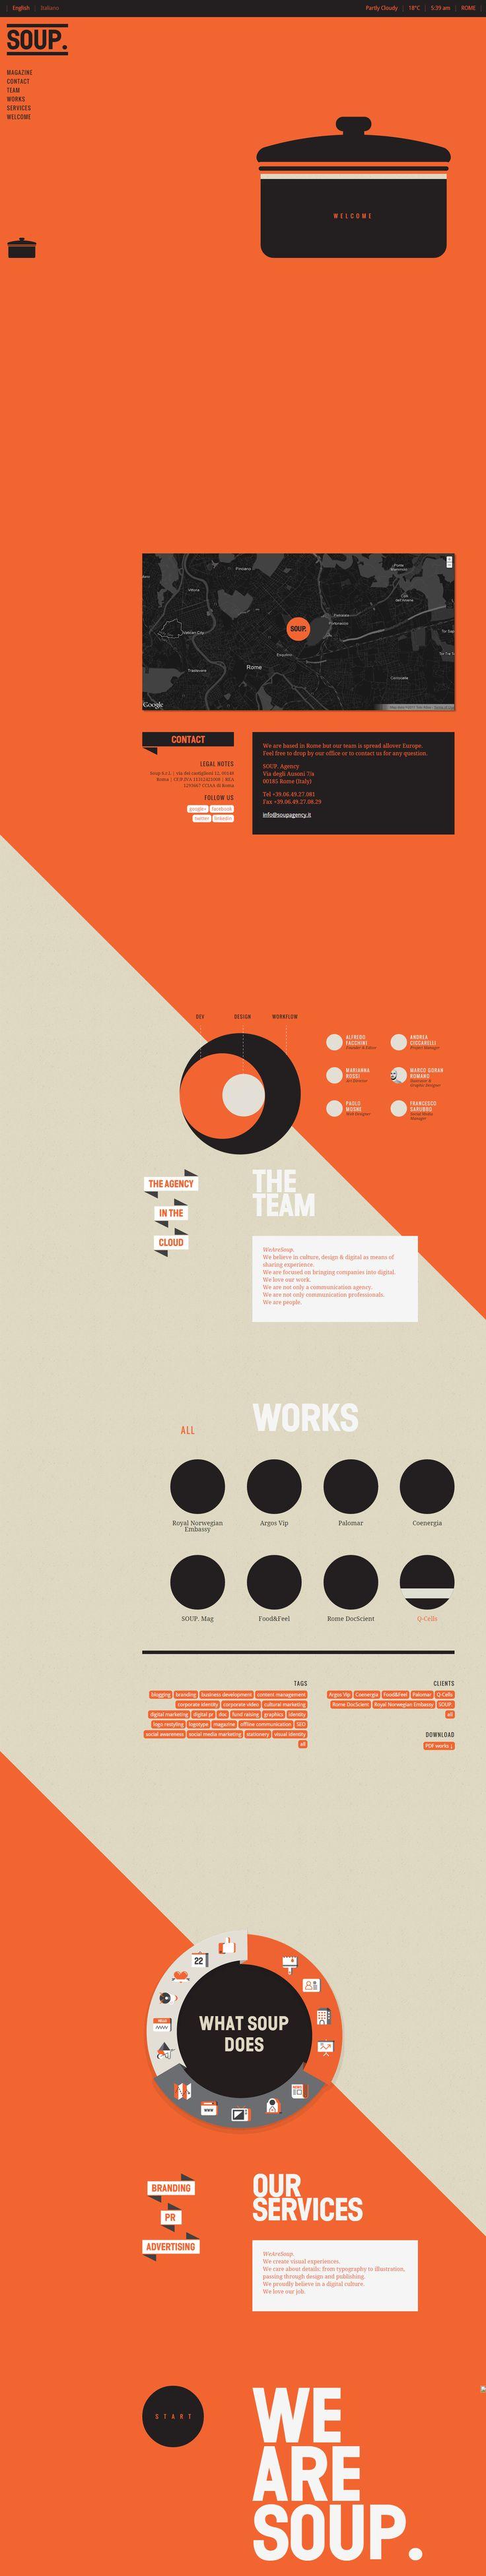 Unique Web Design, Soup Agency #WebDesign #Design (http://www.pinterest.com/aldenchong/)